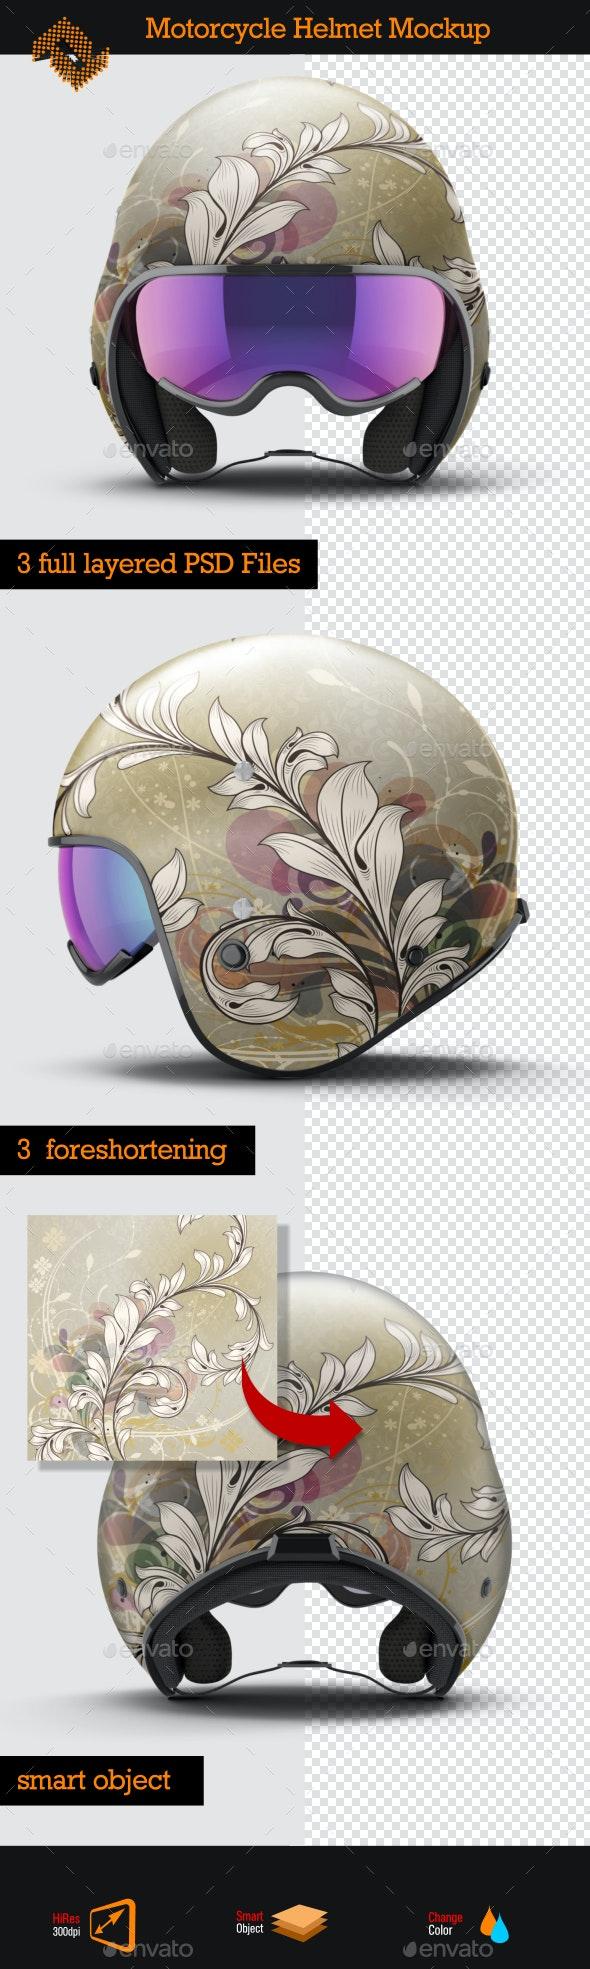 Open Face Motorcycle Helmet Mockup - Product Mock-Ups Graphics